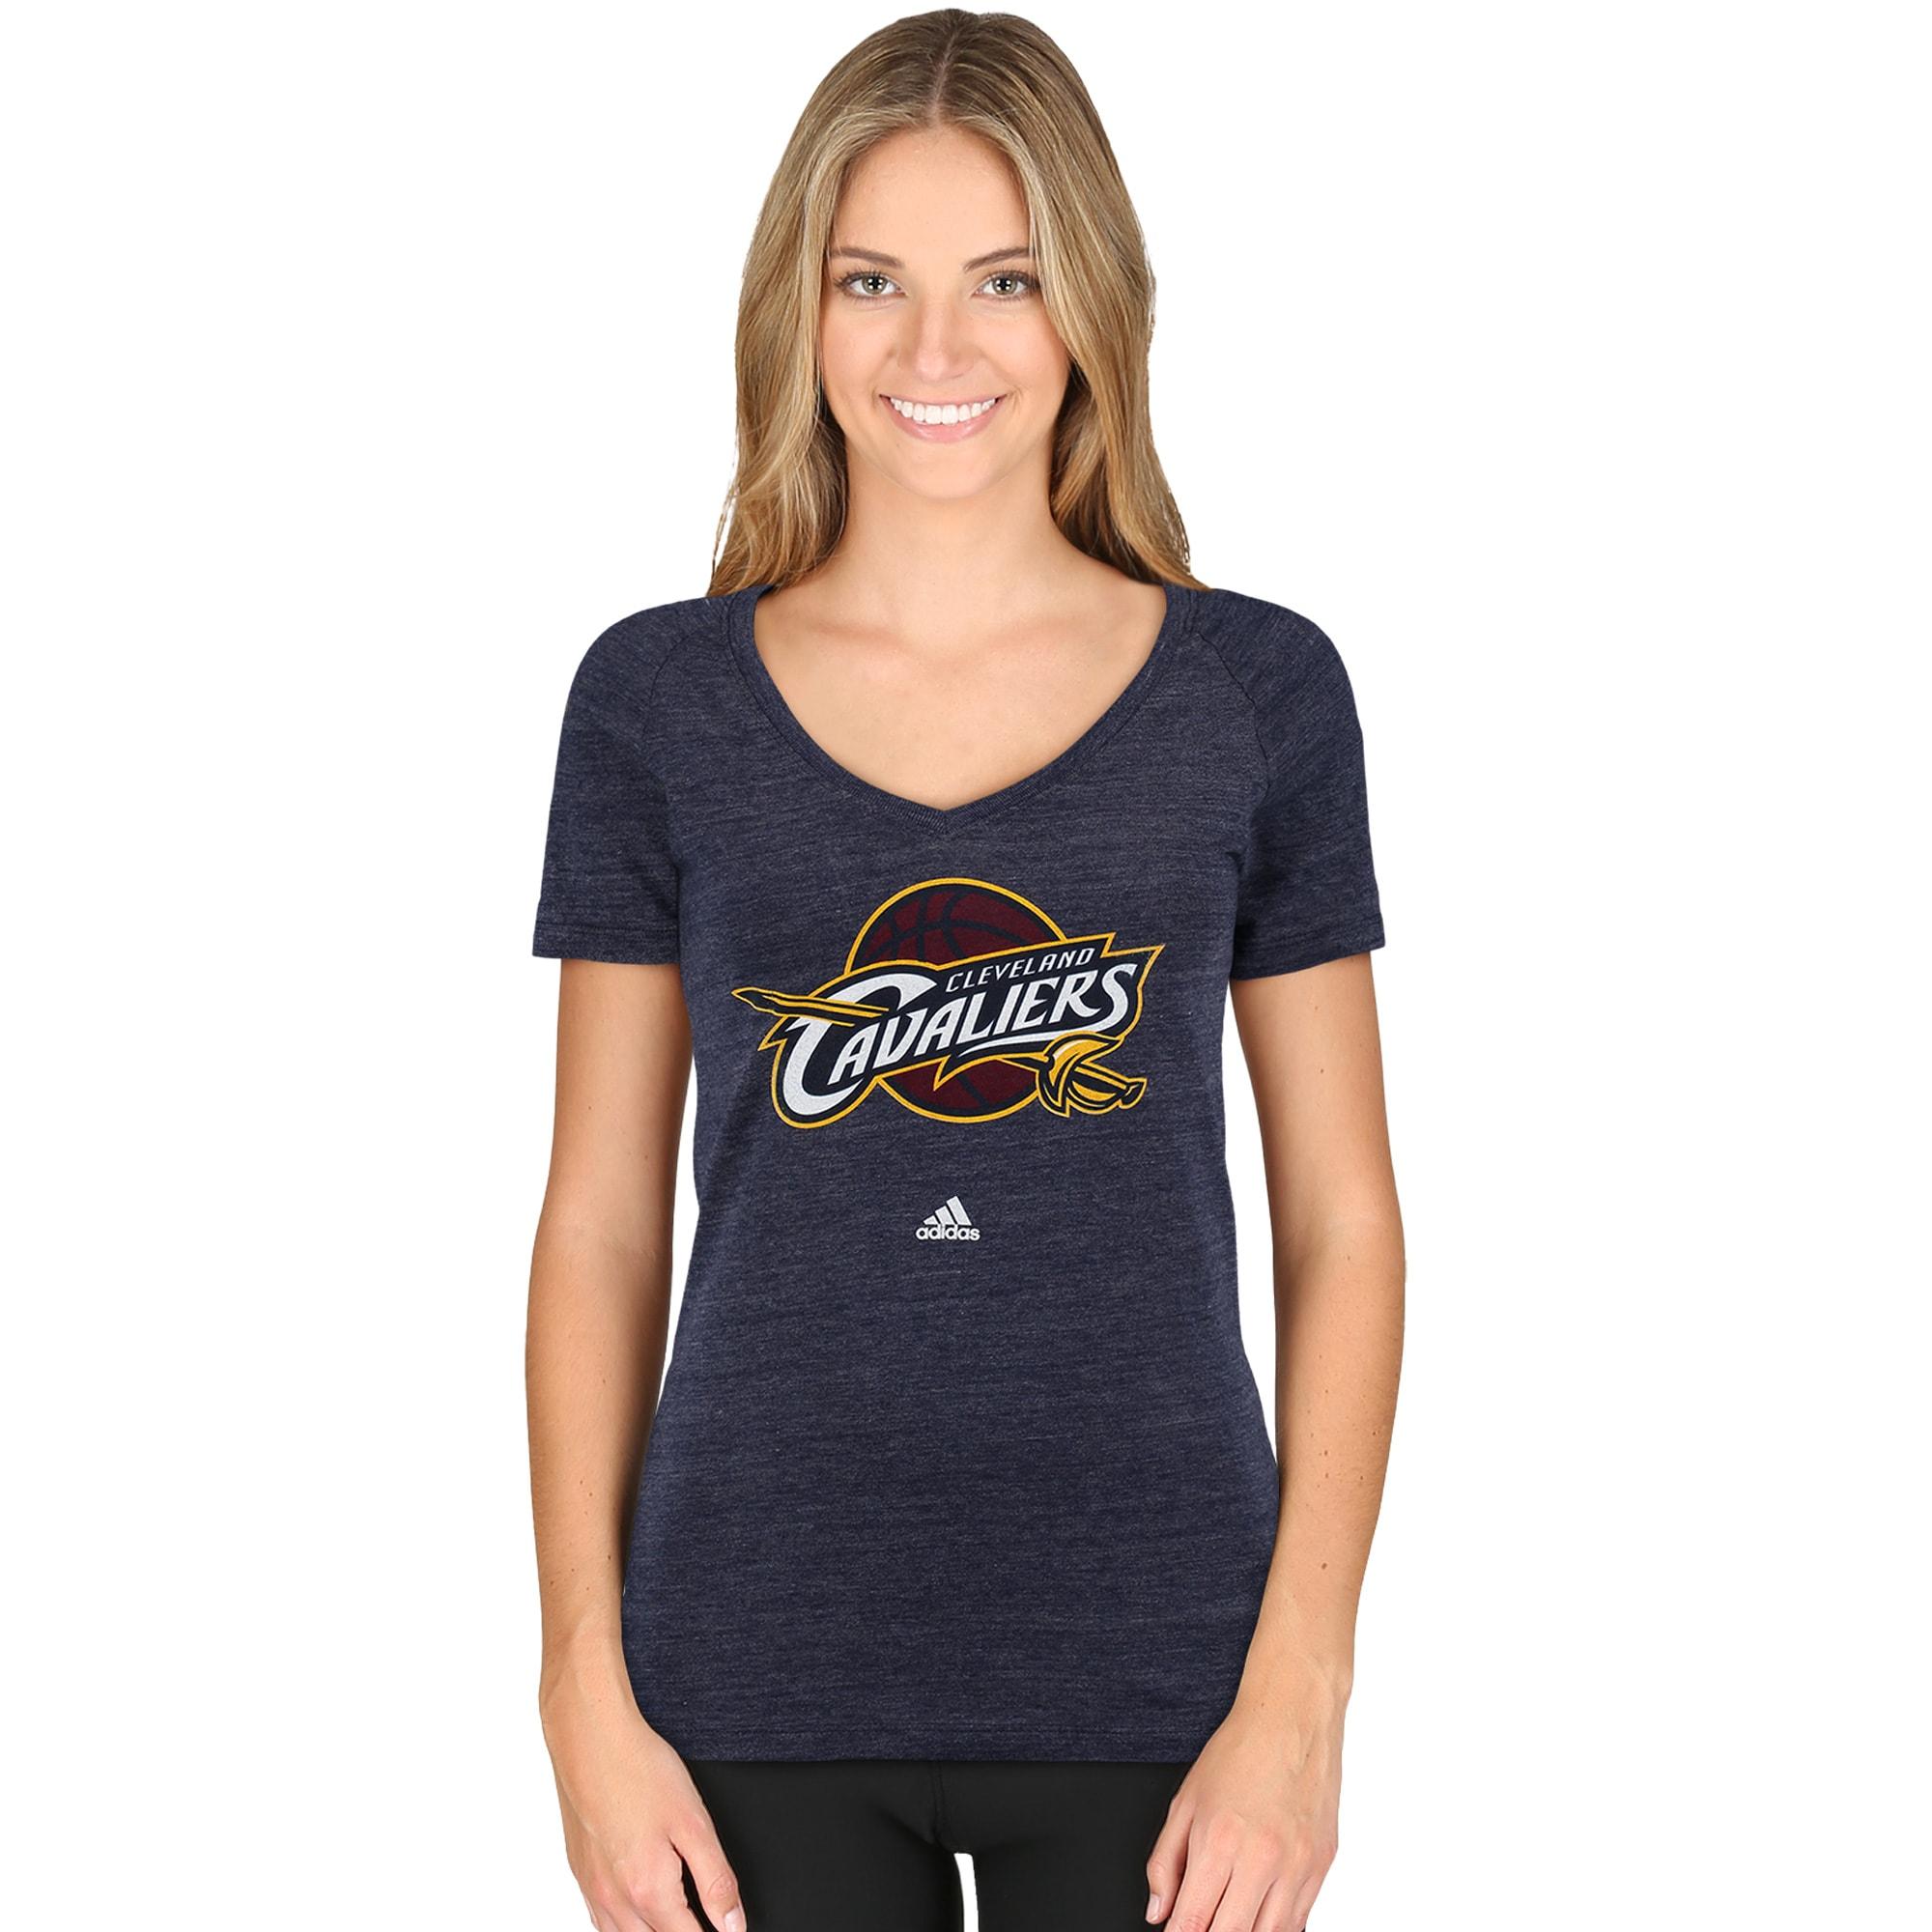 Cleveland Cavaliers adidas Women's Primary Logo Tri-Blend V-Neck T-Shirt - Navy Blue